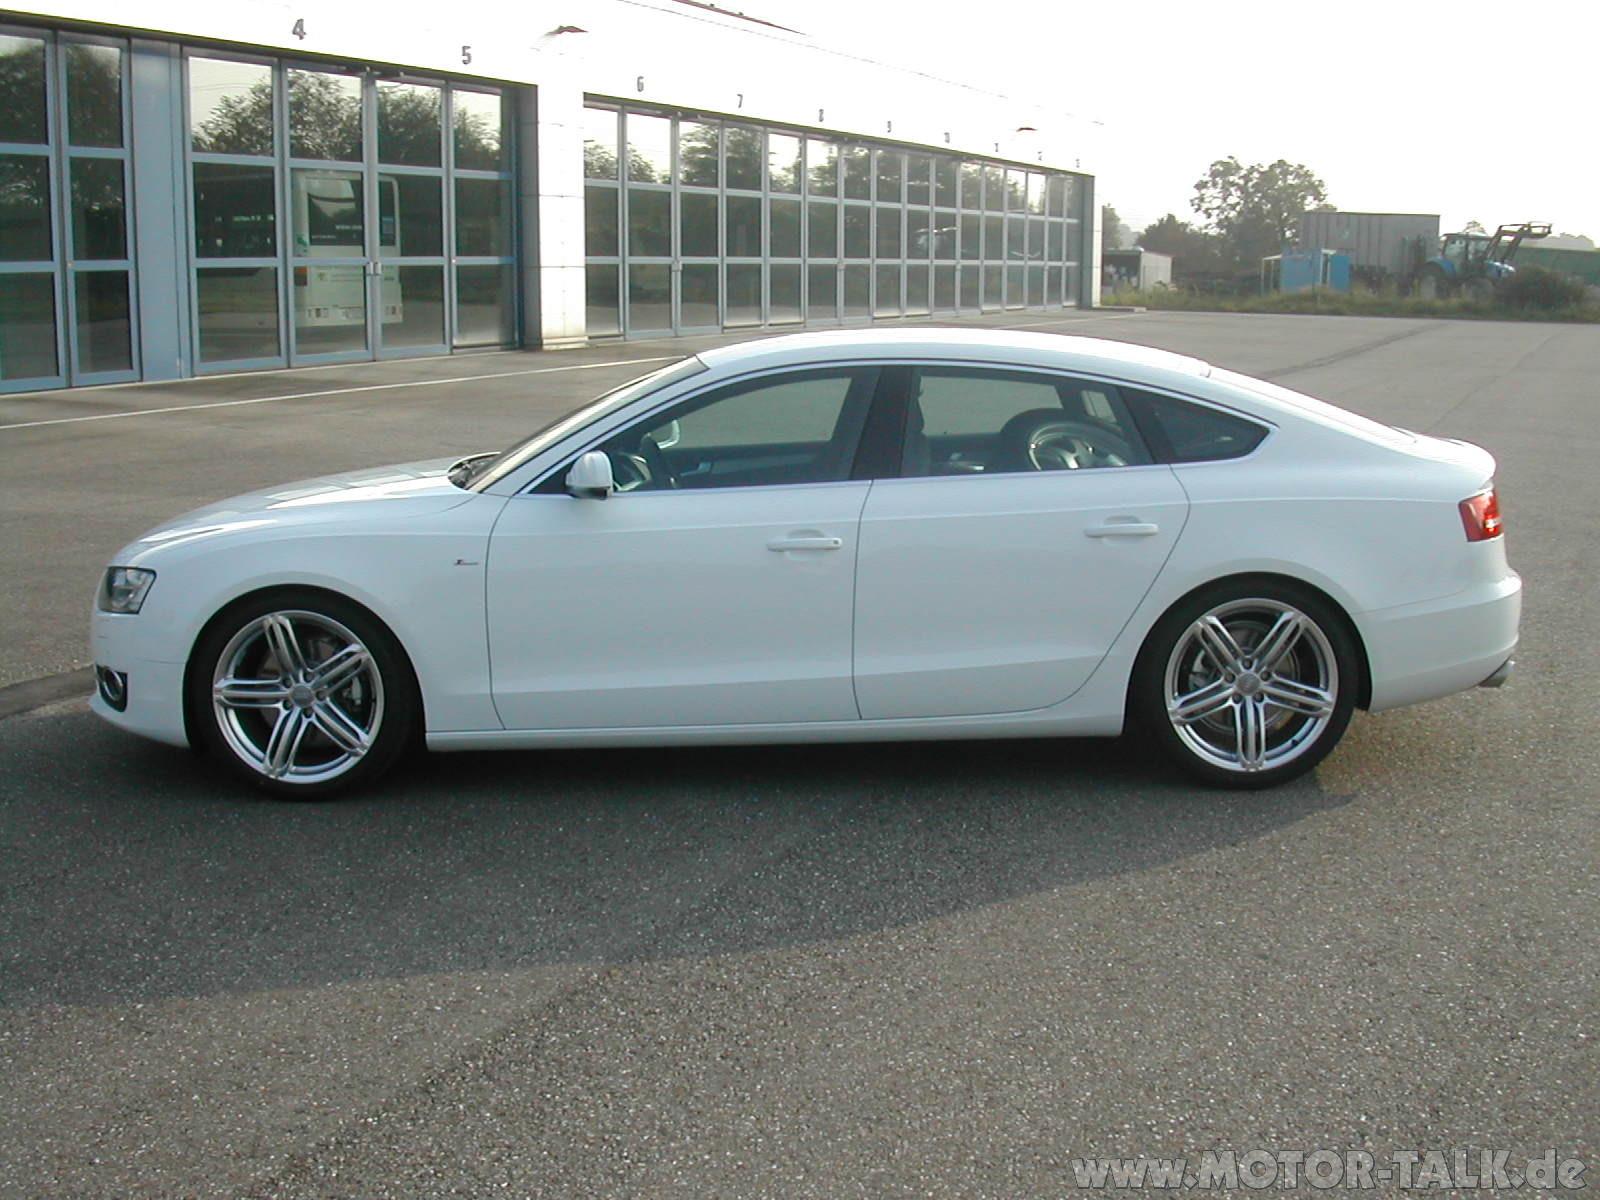 Audi Abholung 013 Suche Bilder Vom A5 Sportback